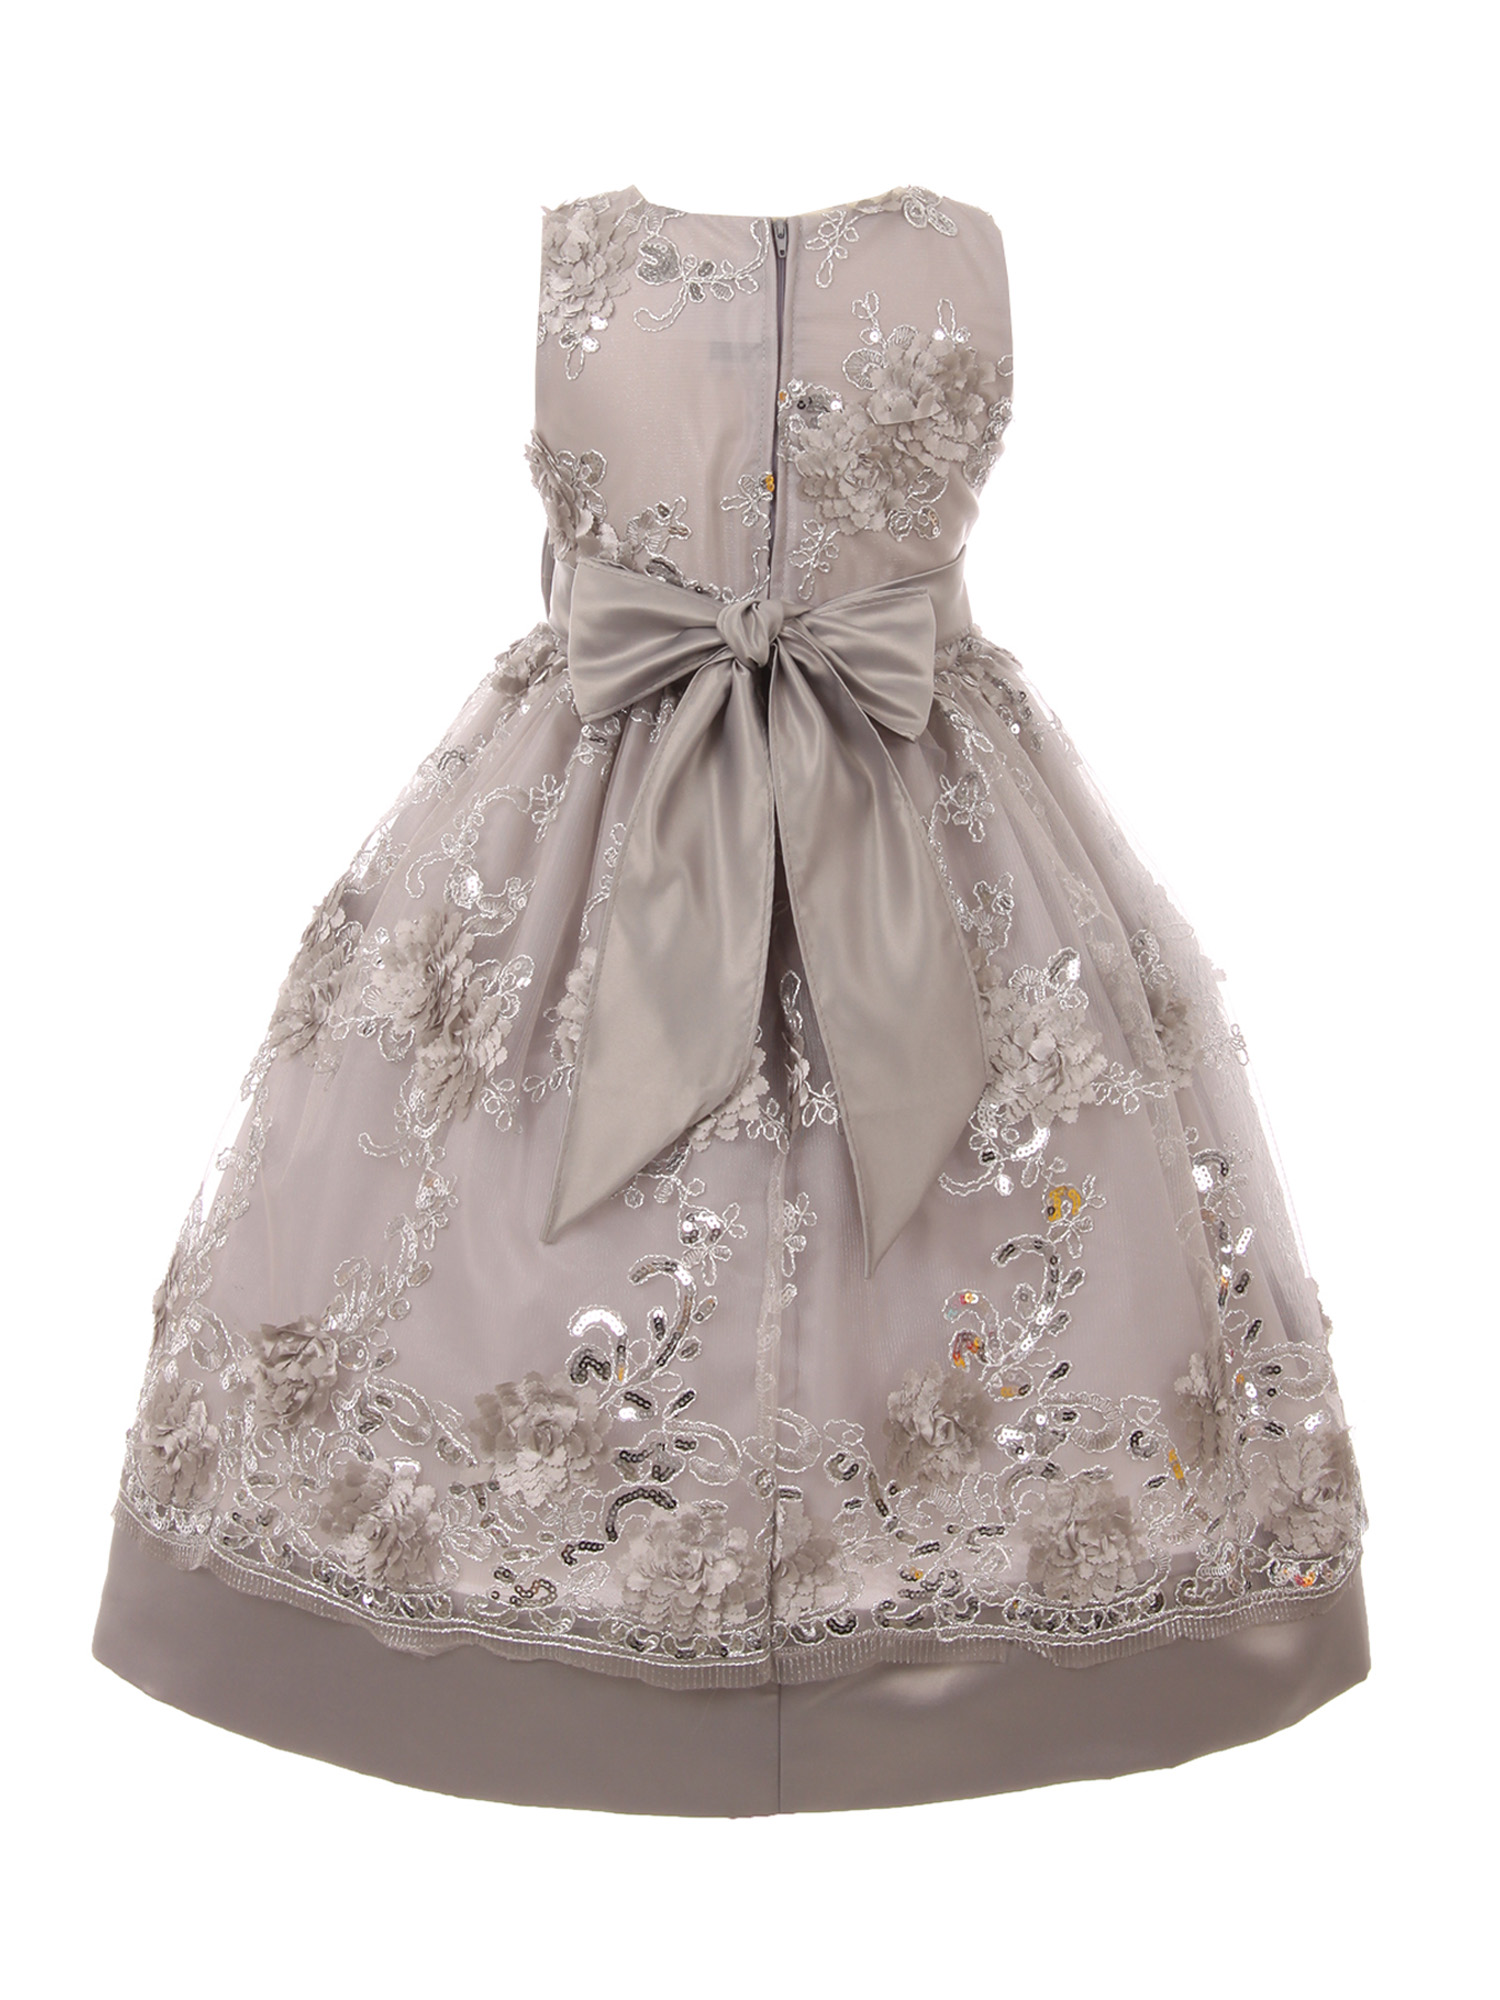 Shanil Inc. - Little Girls Silver Sparkle Sequin Embroidery Bow Accent Flower Girl Dress - Walmart.com